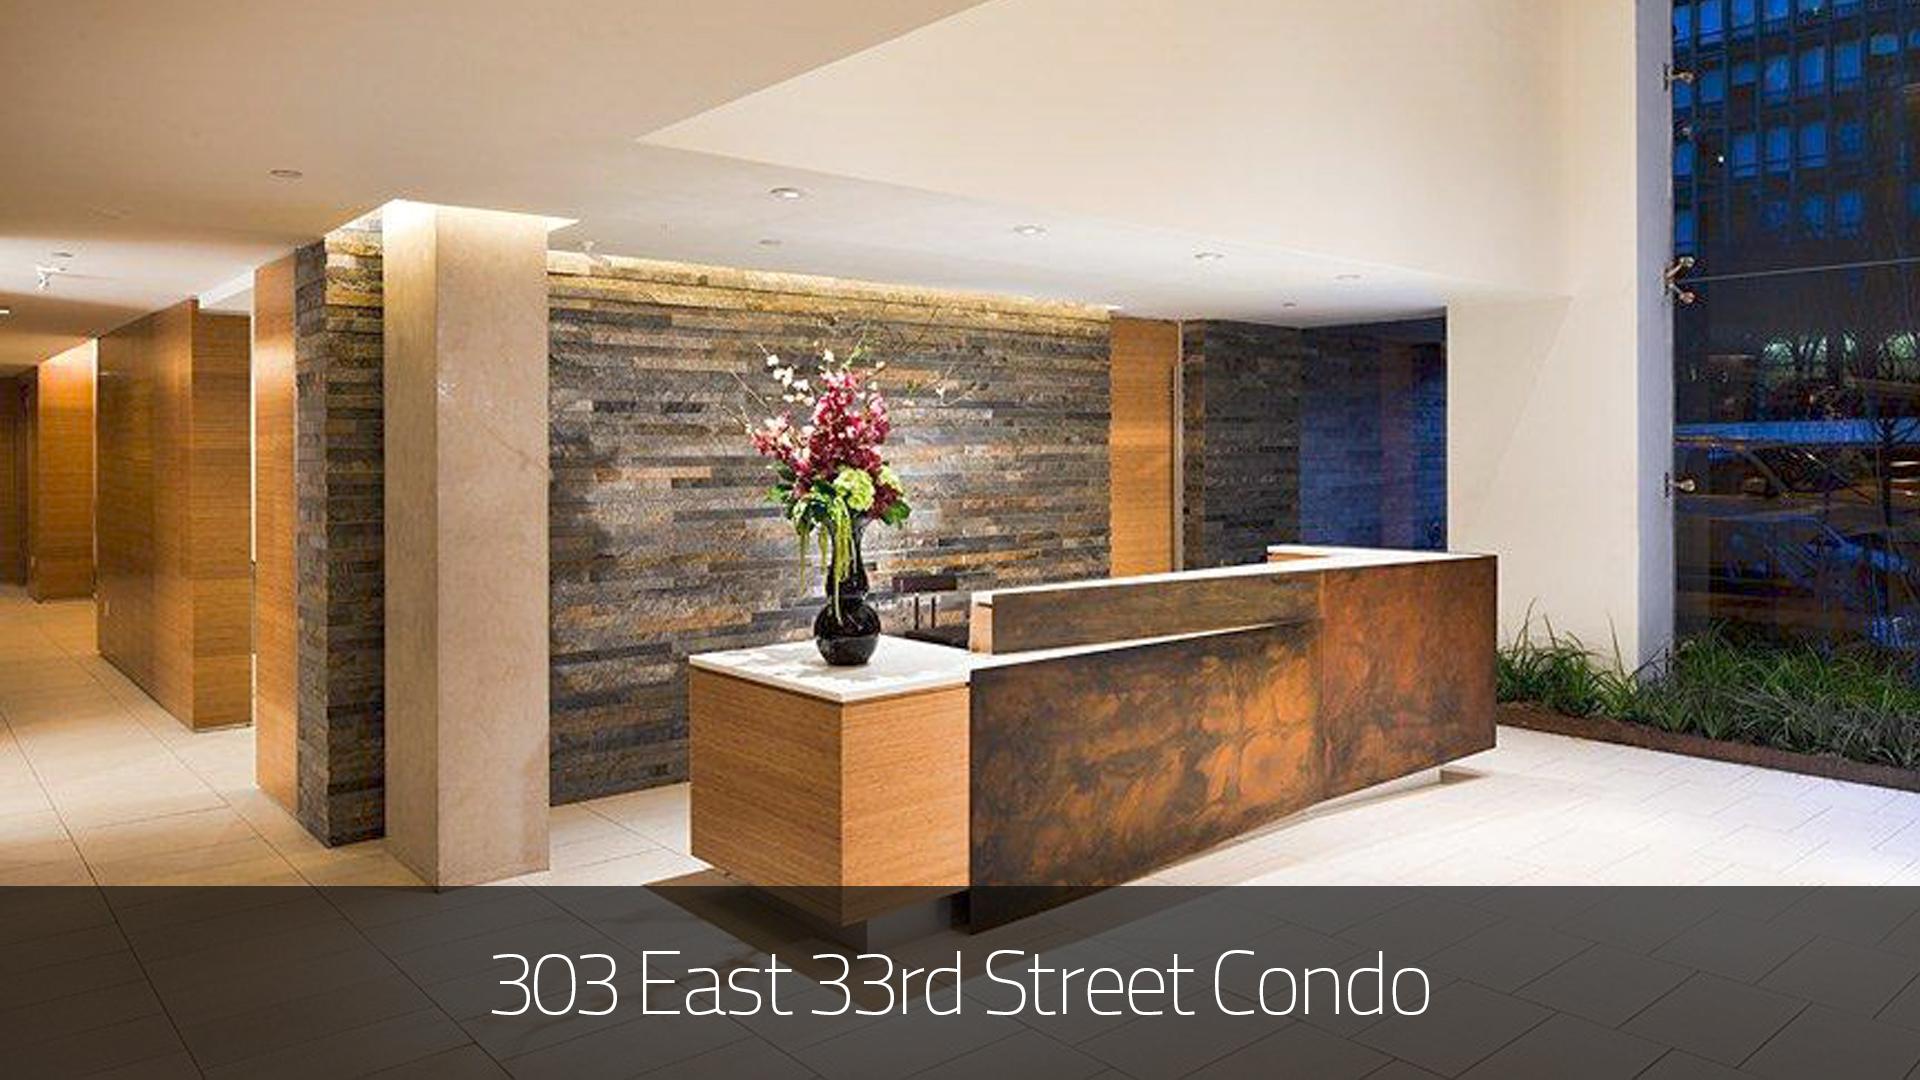 303 east 33rd street condo